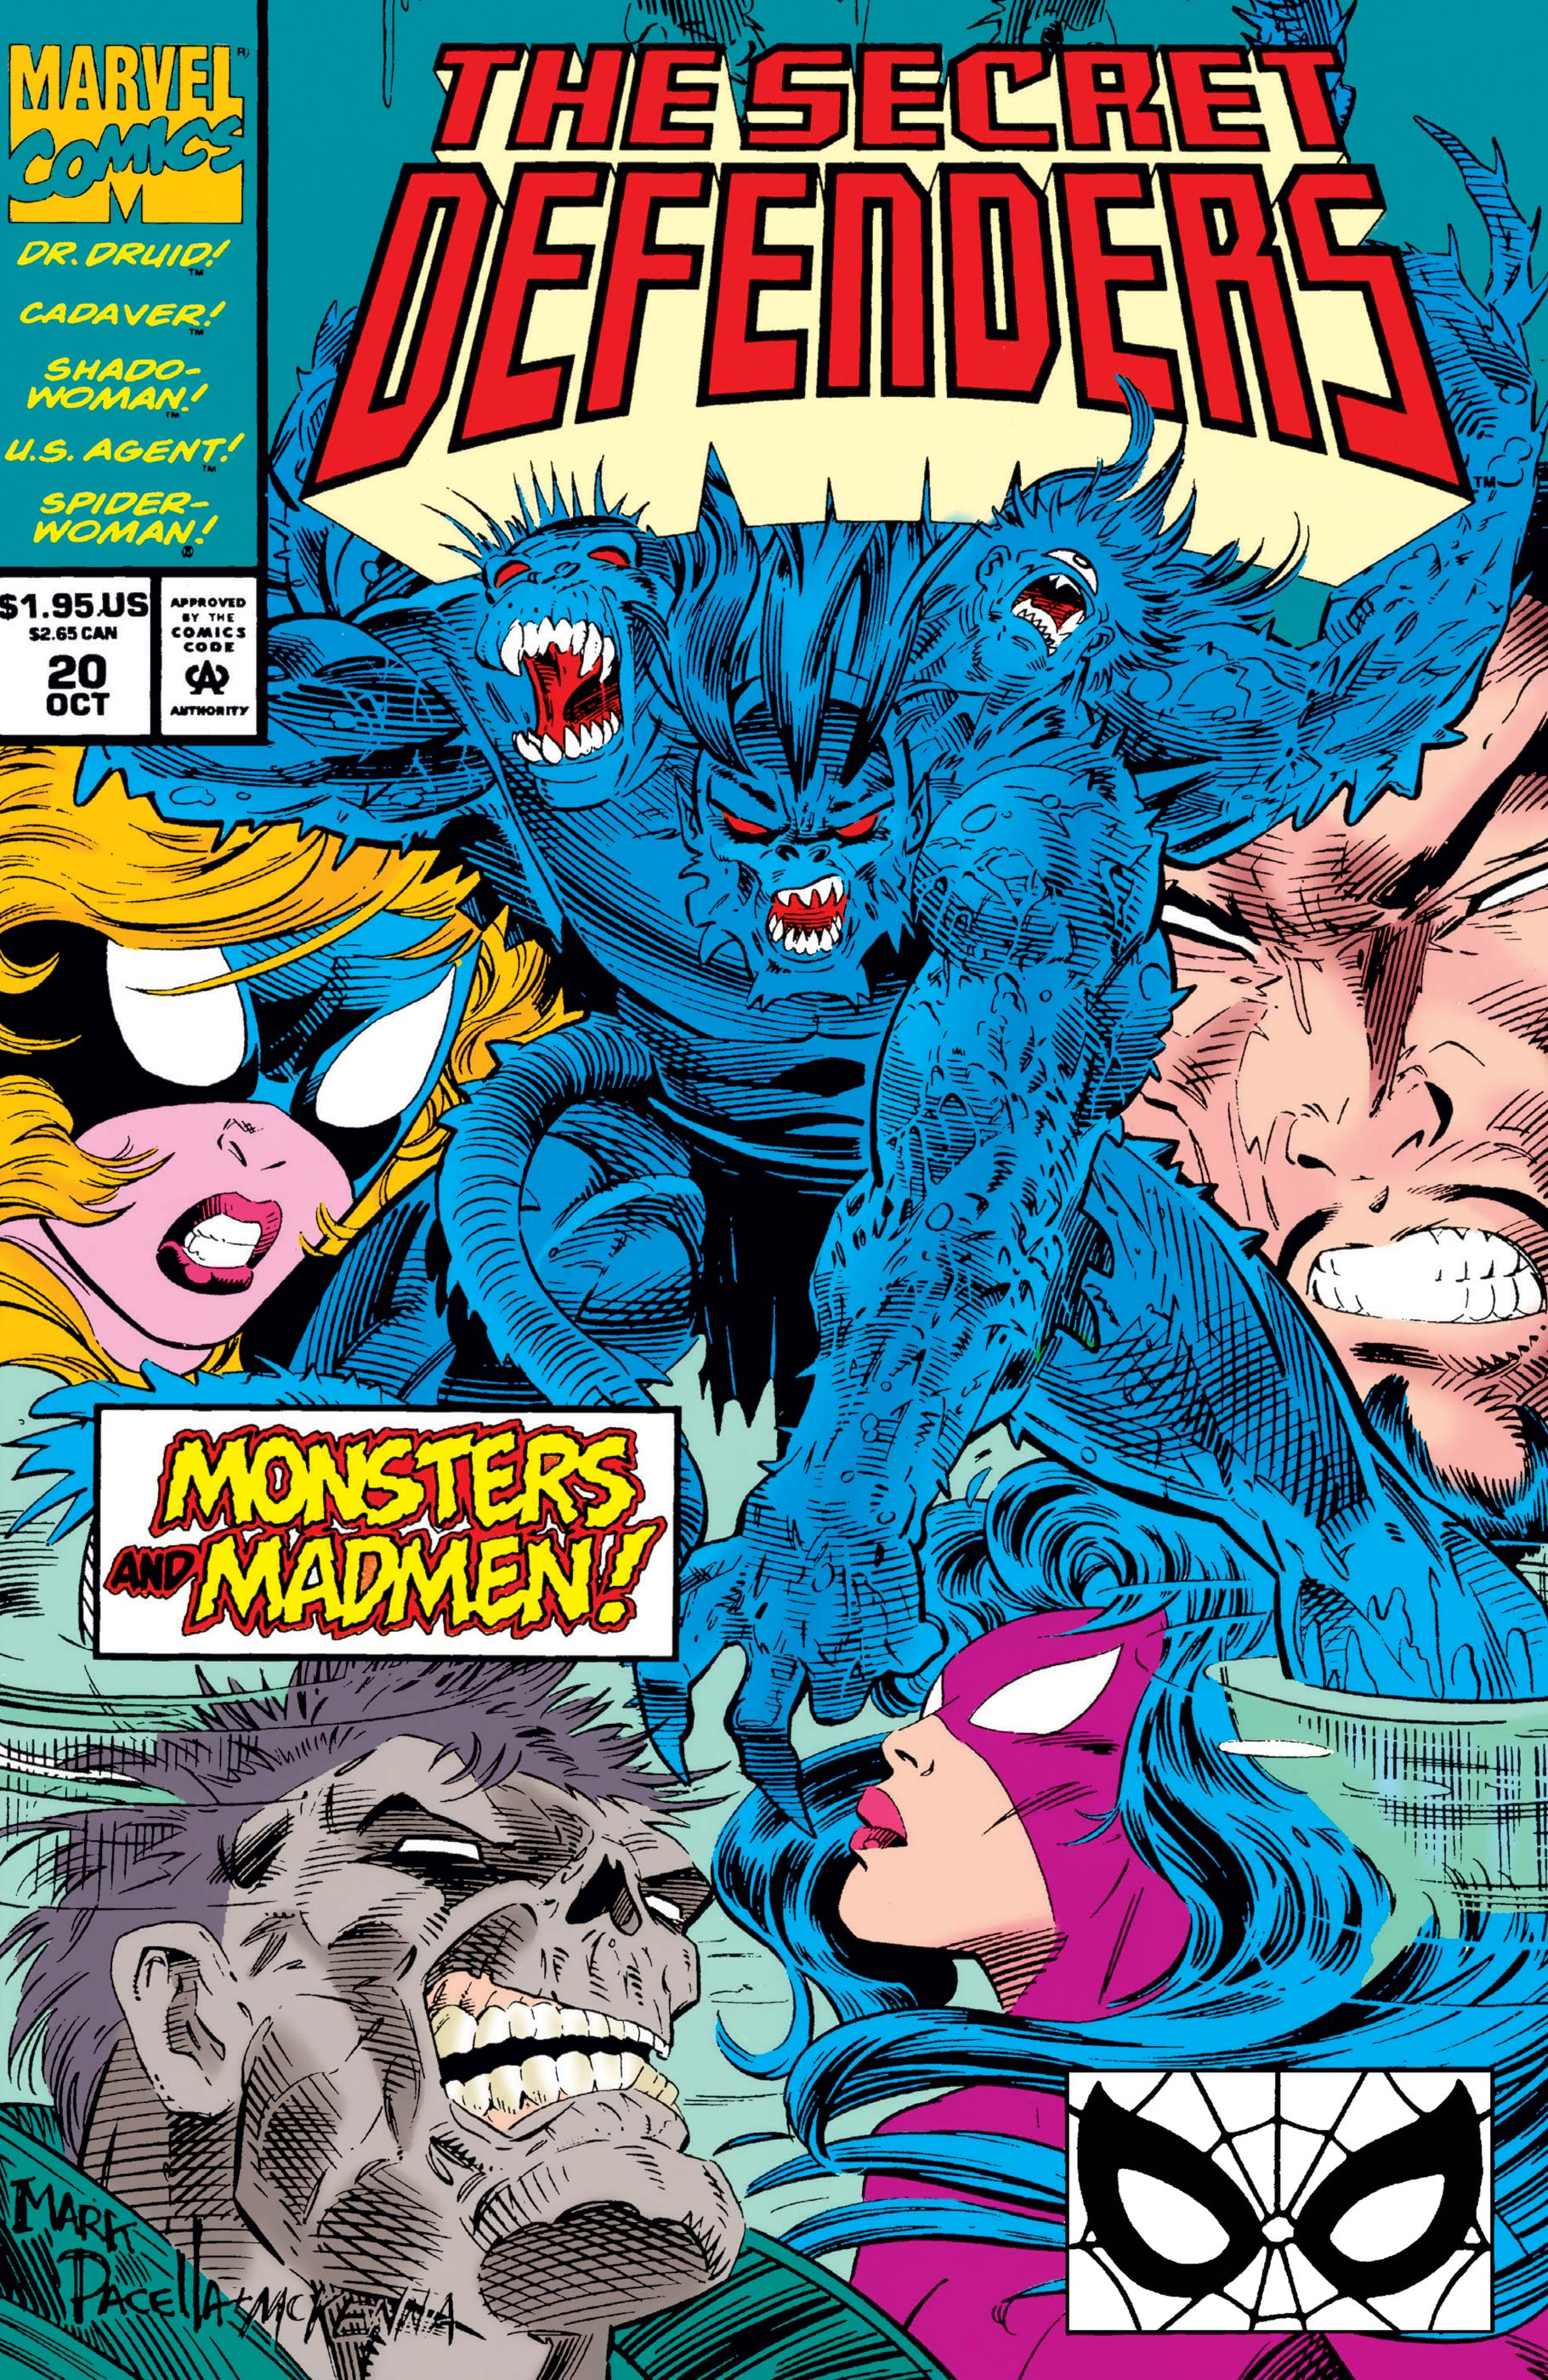 Secret Defenders (1993) #20